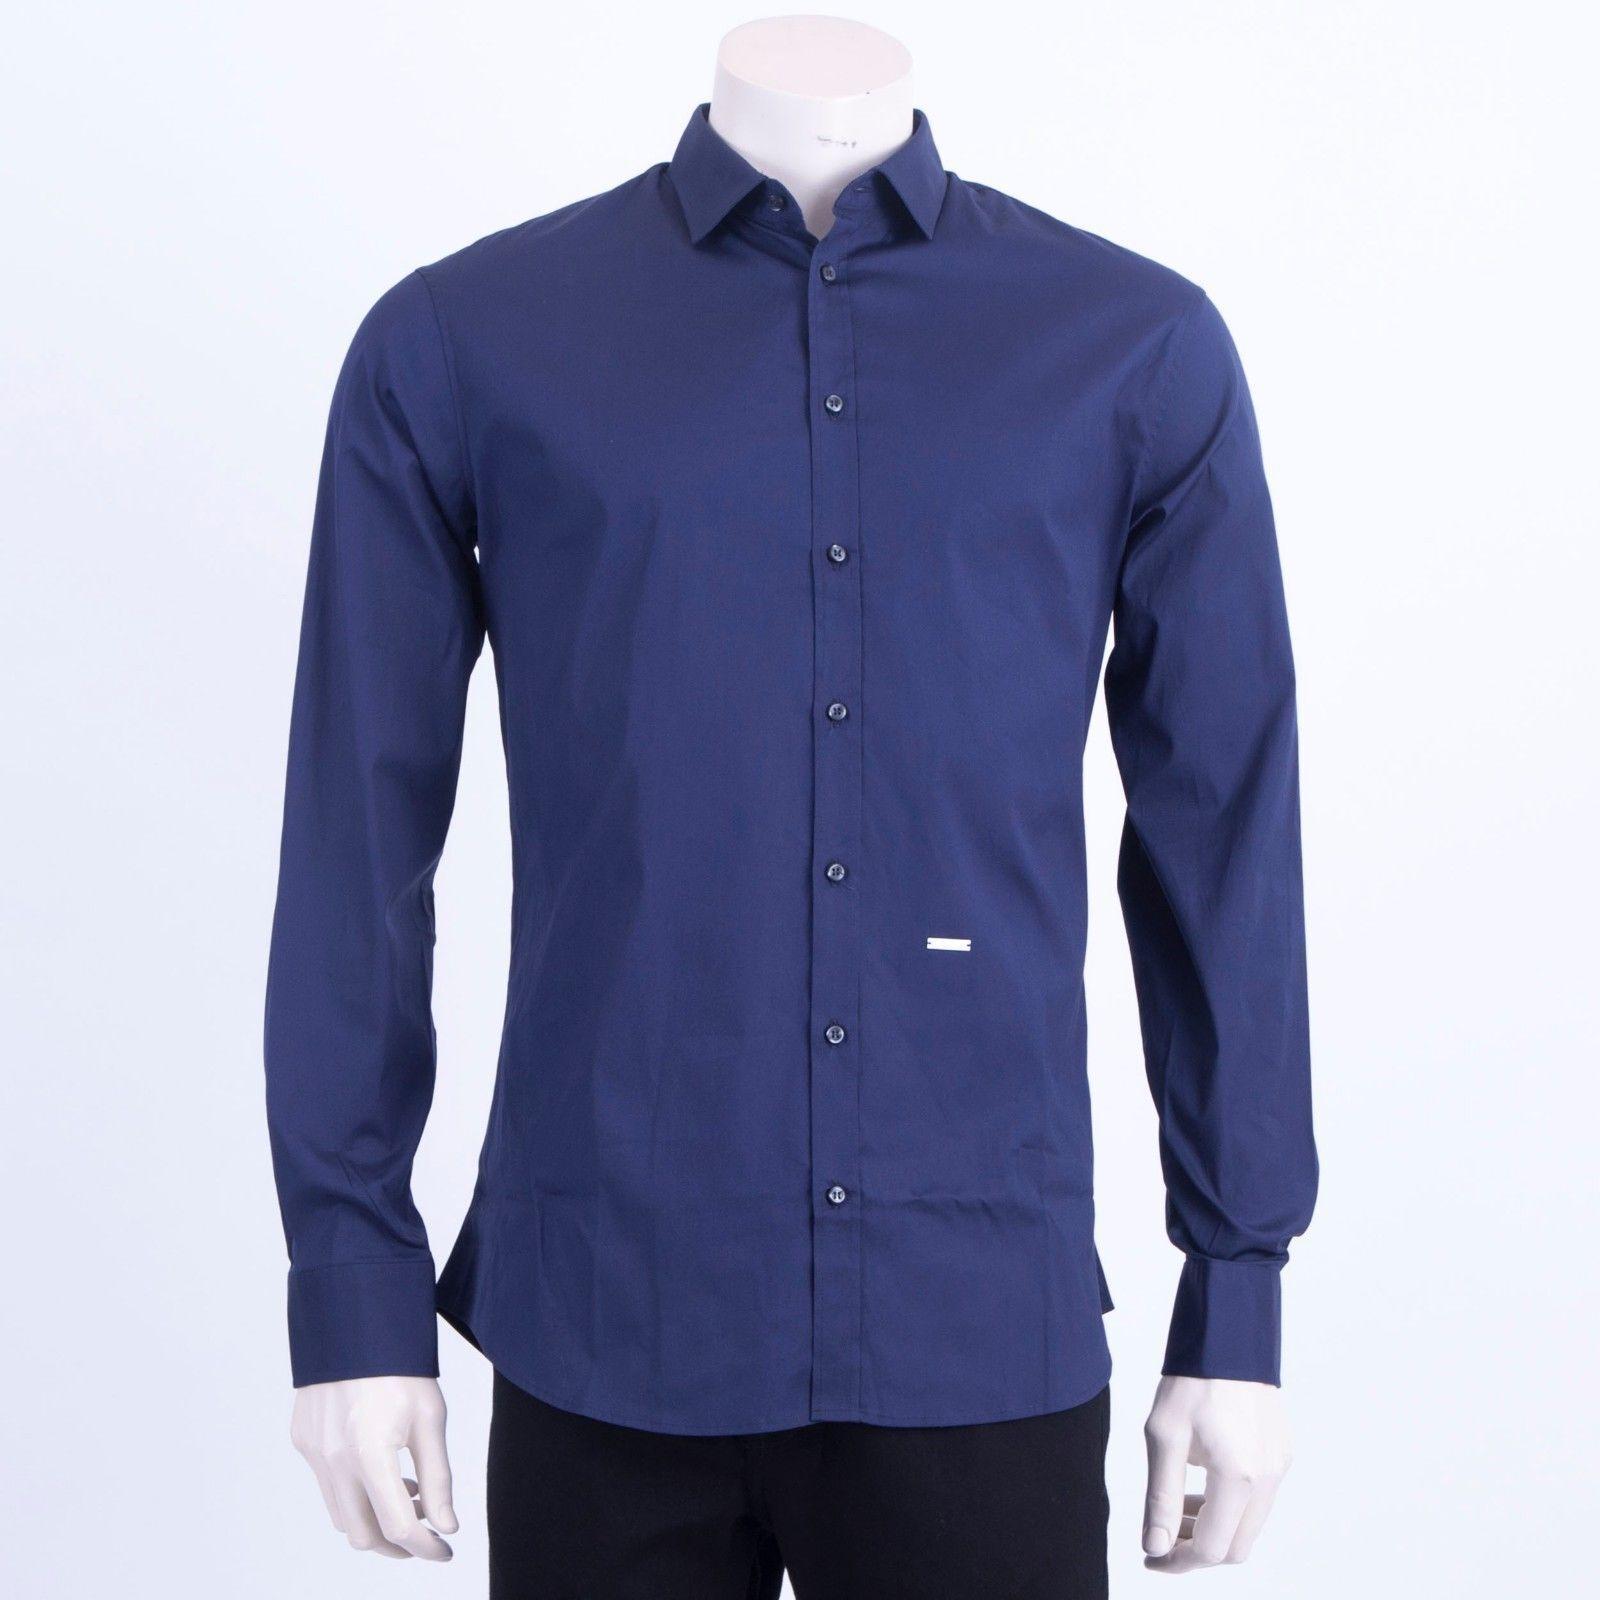 295  DSQUARED2 Classic bluee Stretch Cotton Longsleeve Dress Shirt